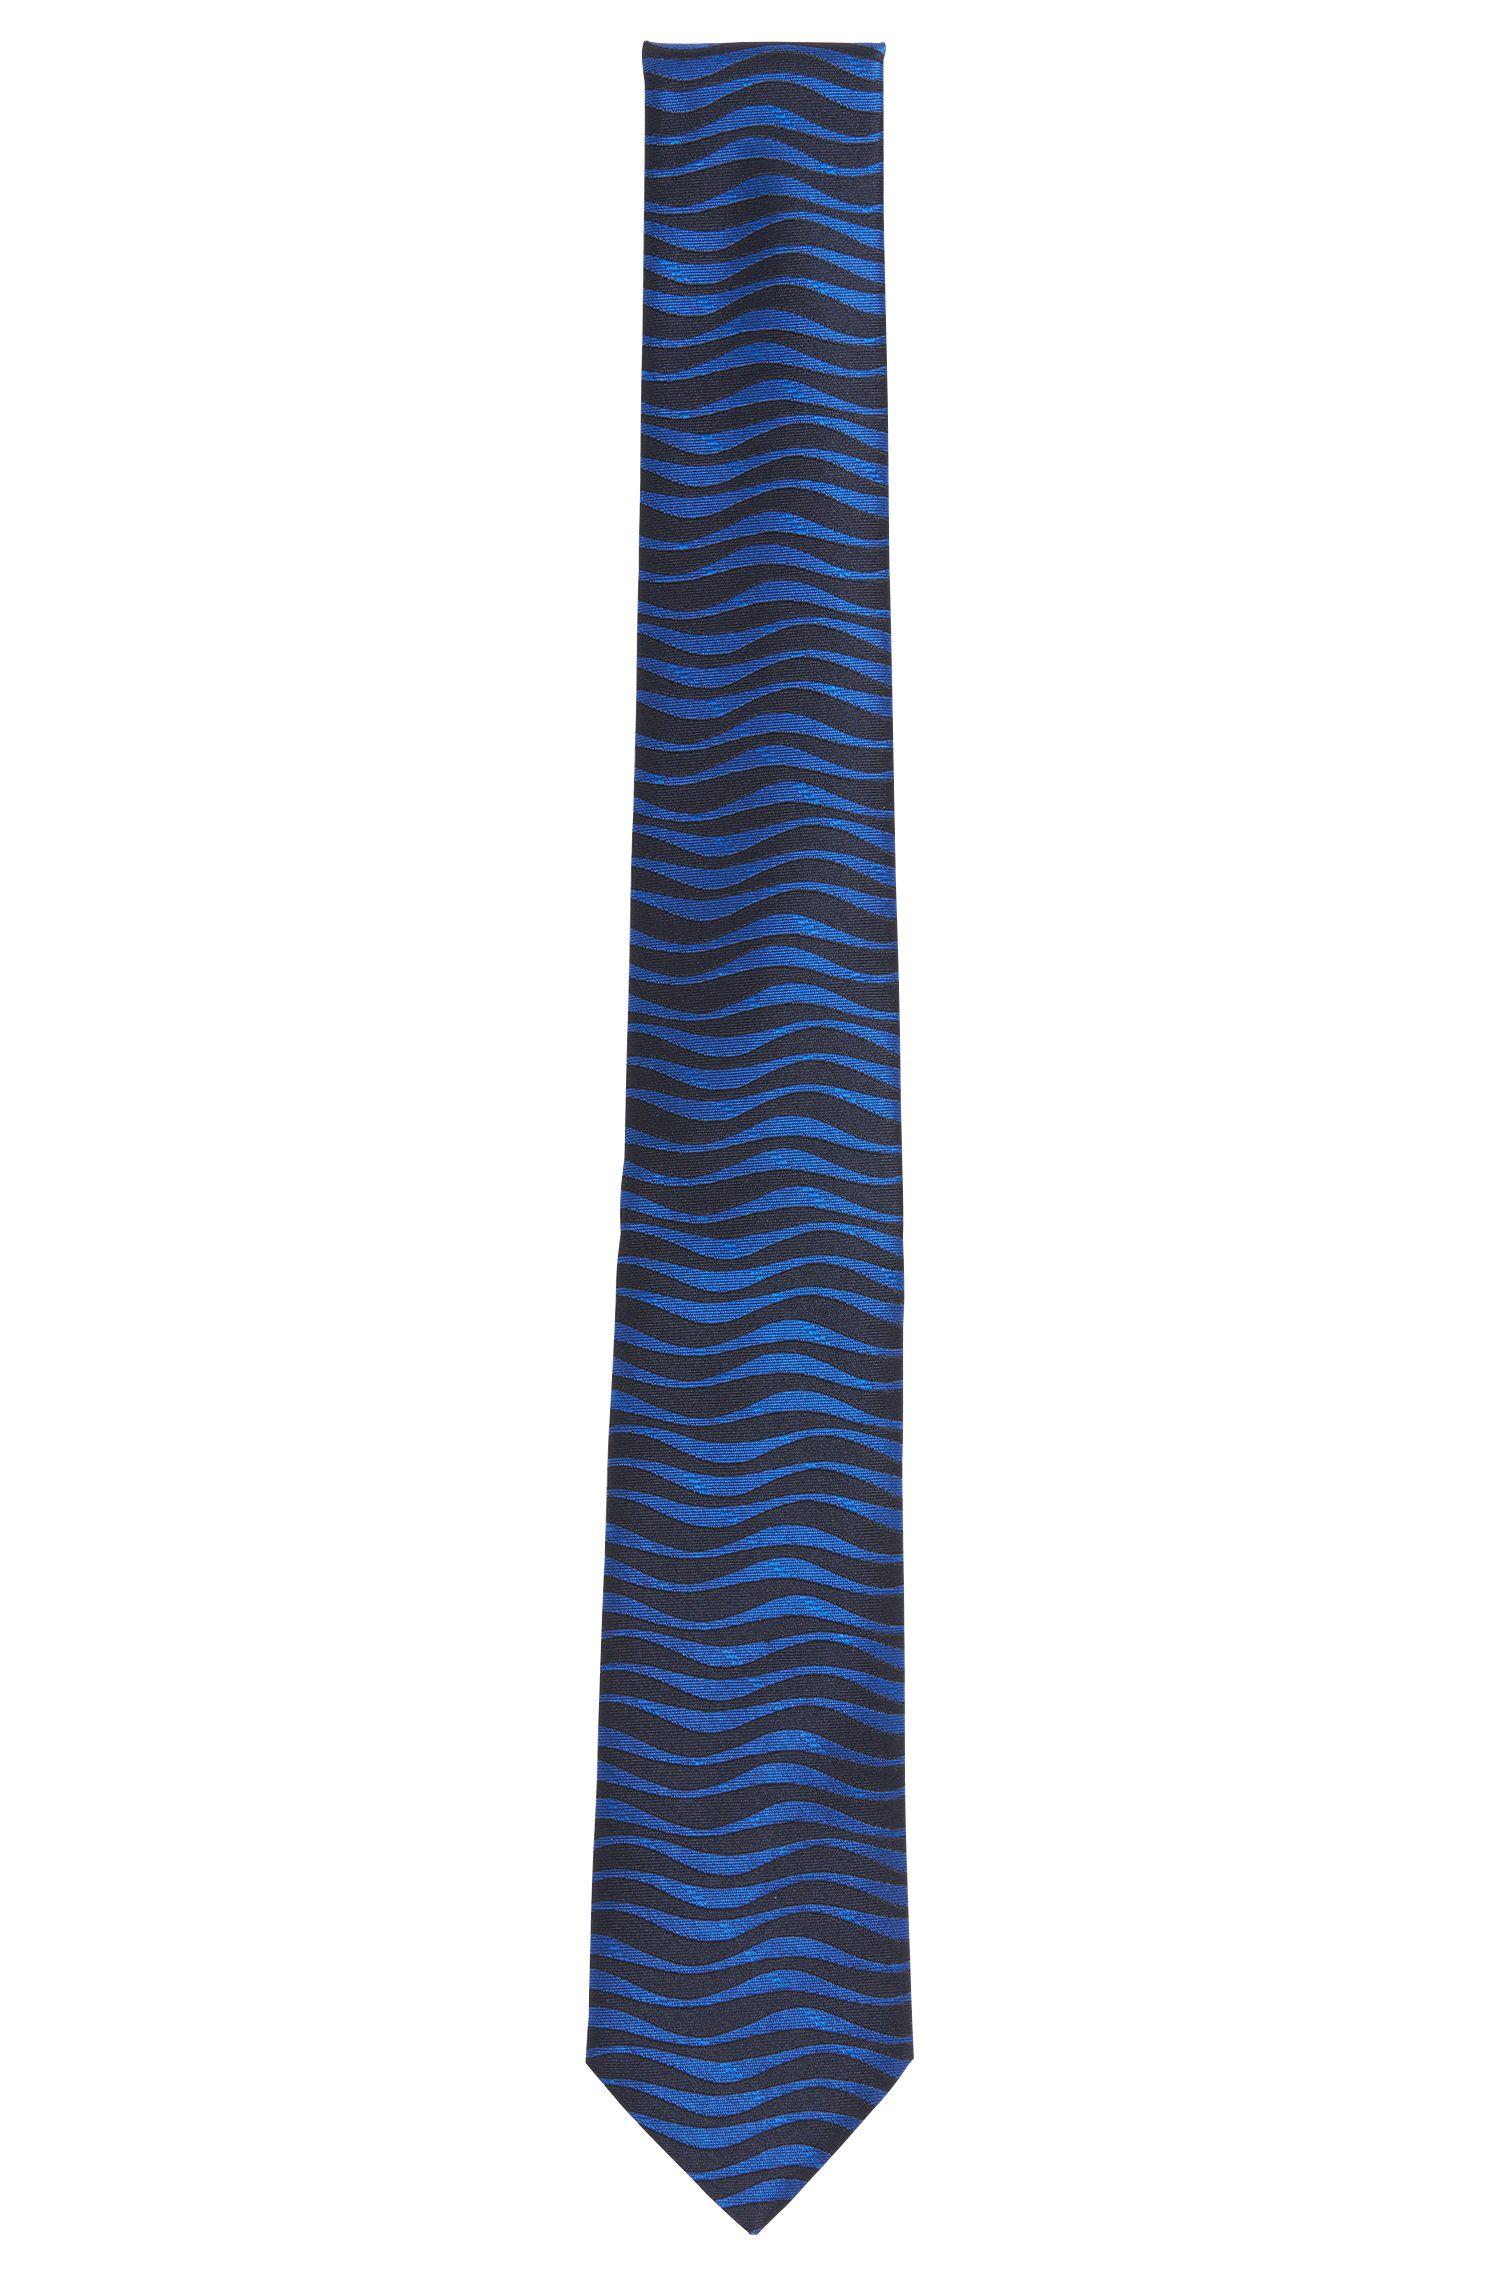 Schmale Krawatte aus gemusterter Seide: 'Tie 6 cm'